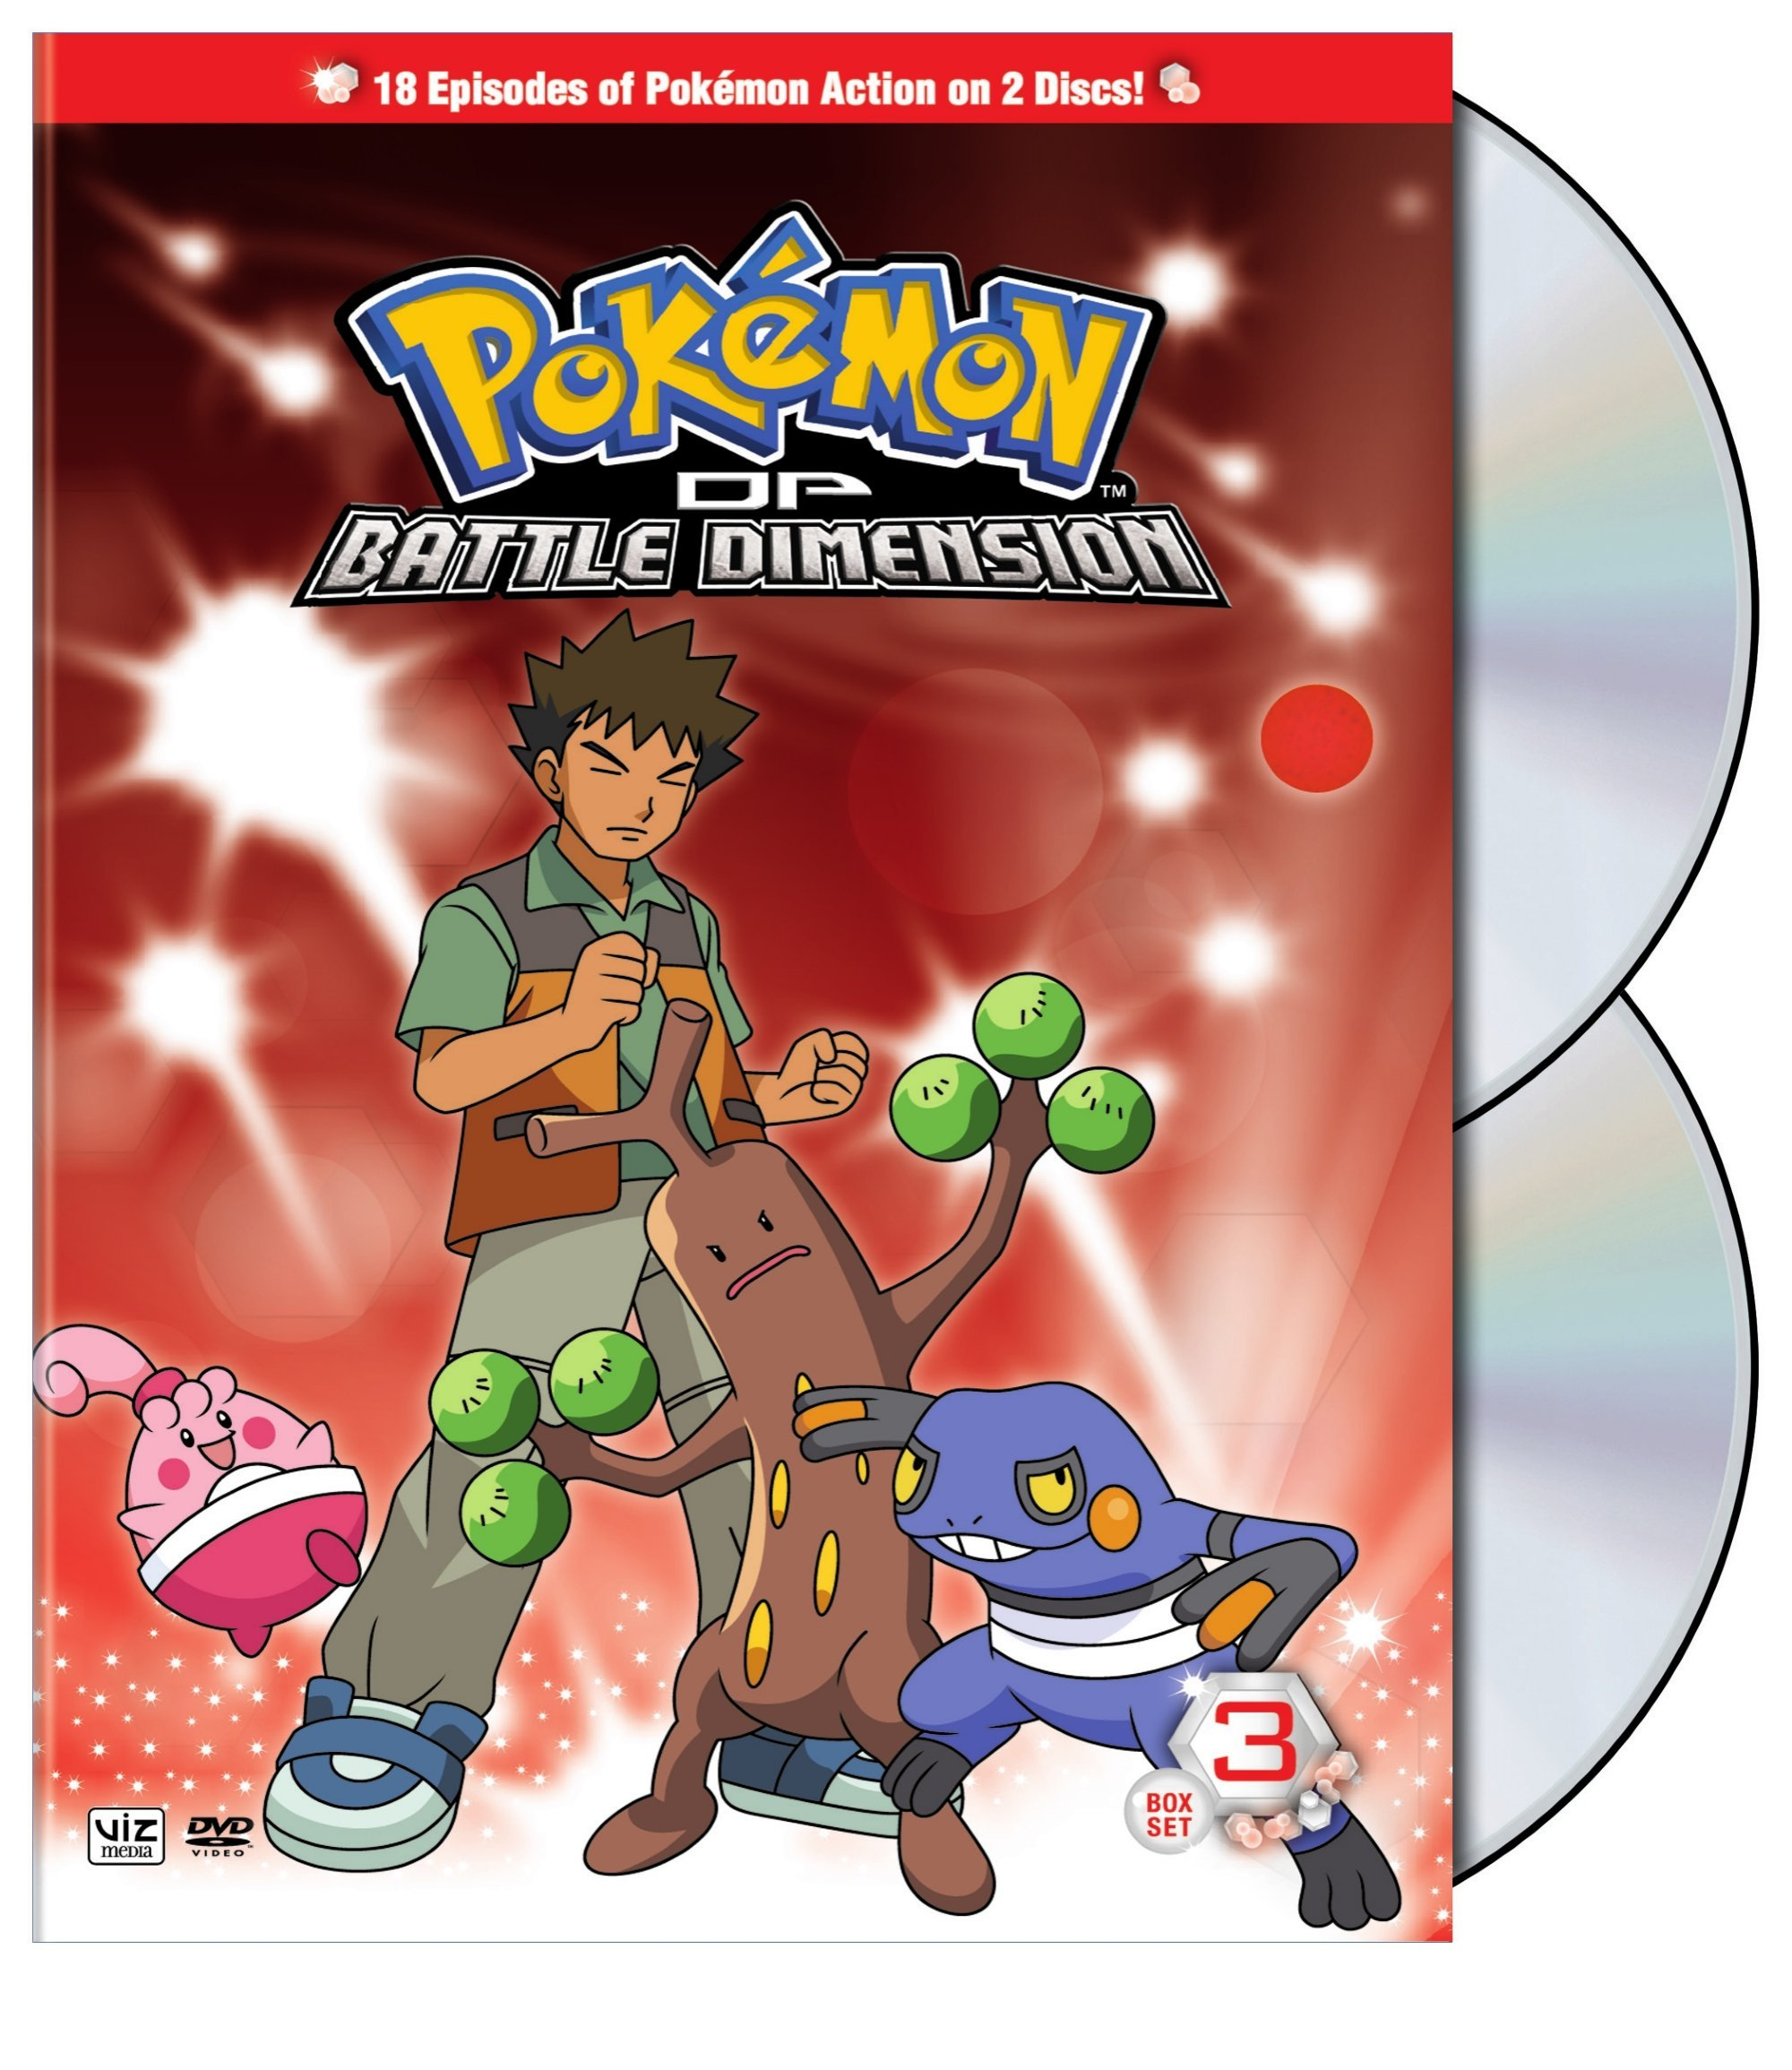 Pokemon Diamond and Pearl Battle Dimension Box Set 3